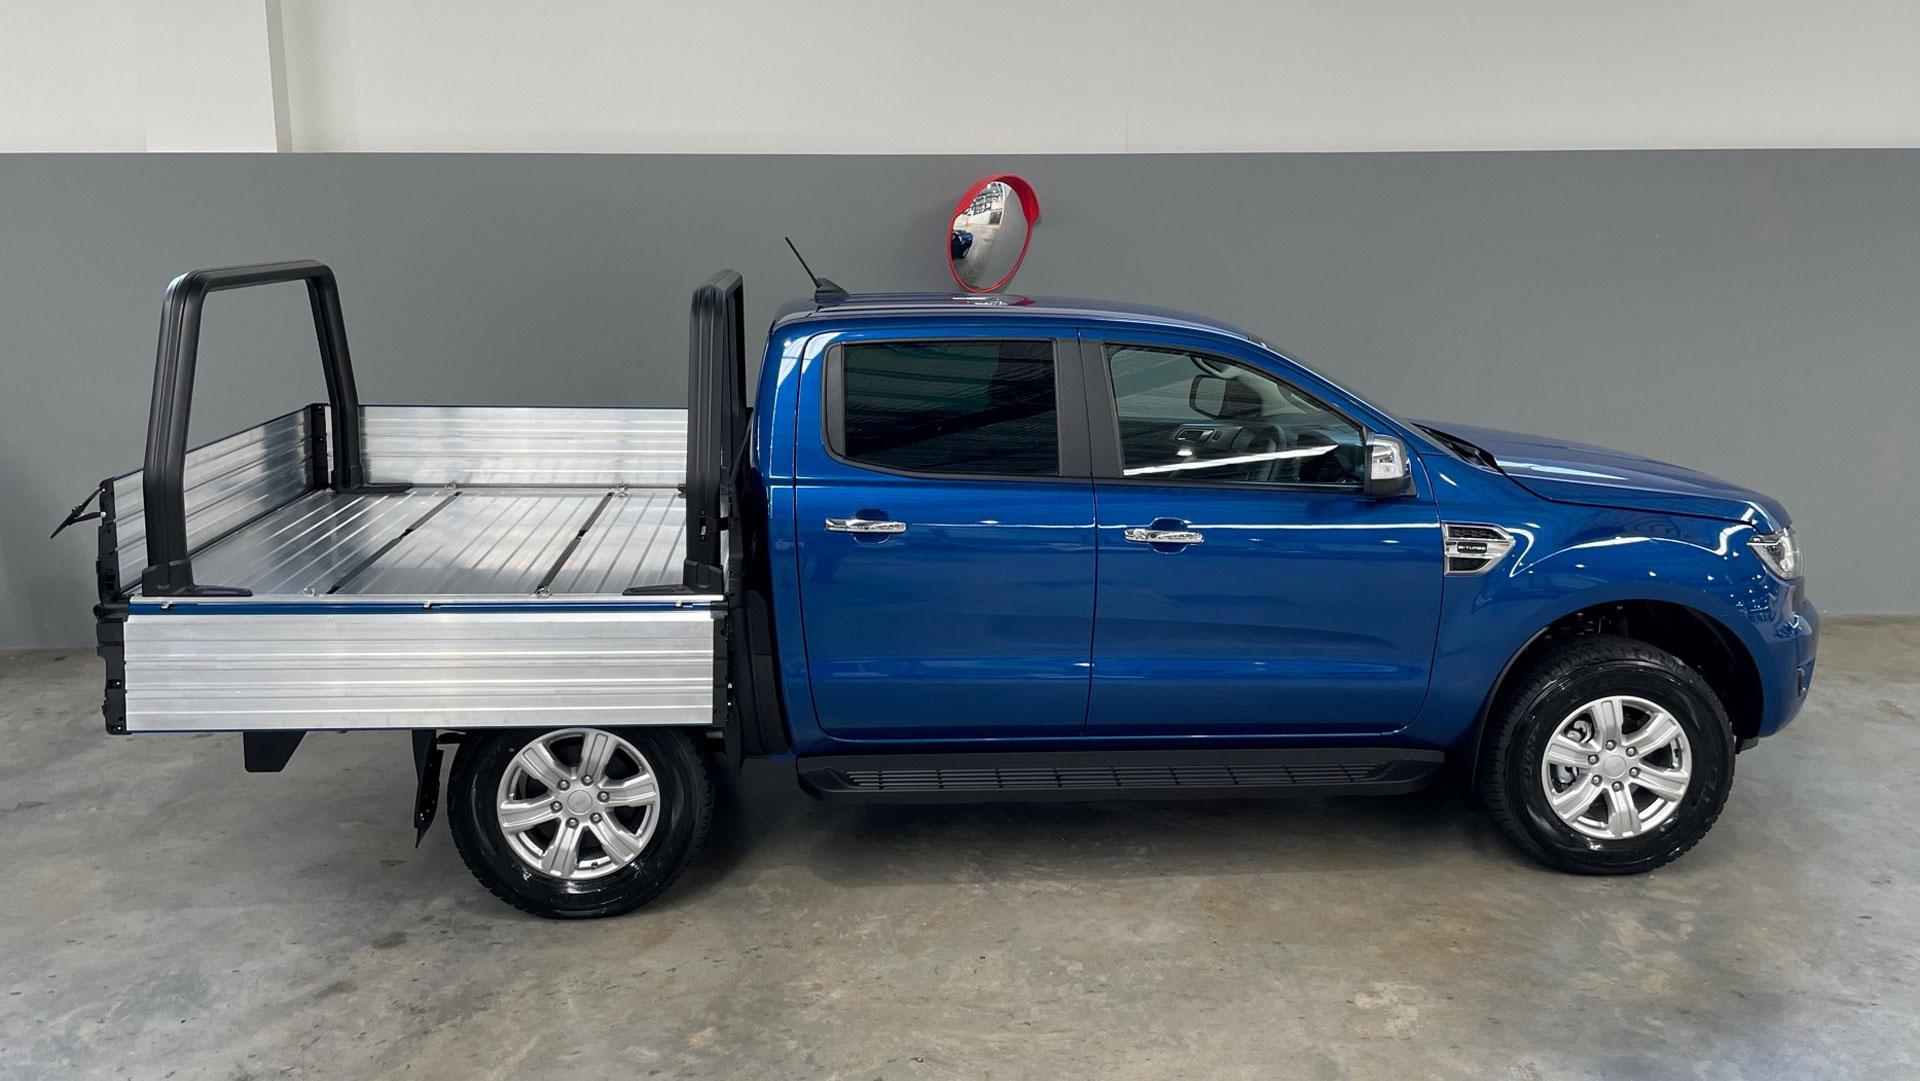 Sport Utility Bed on Ford Ranger